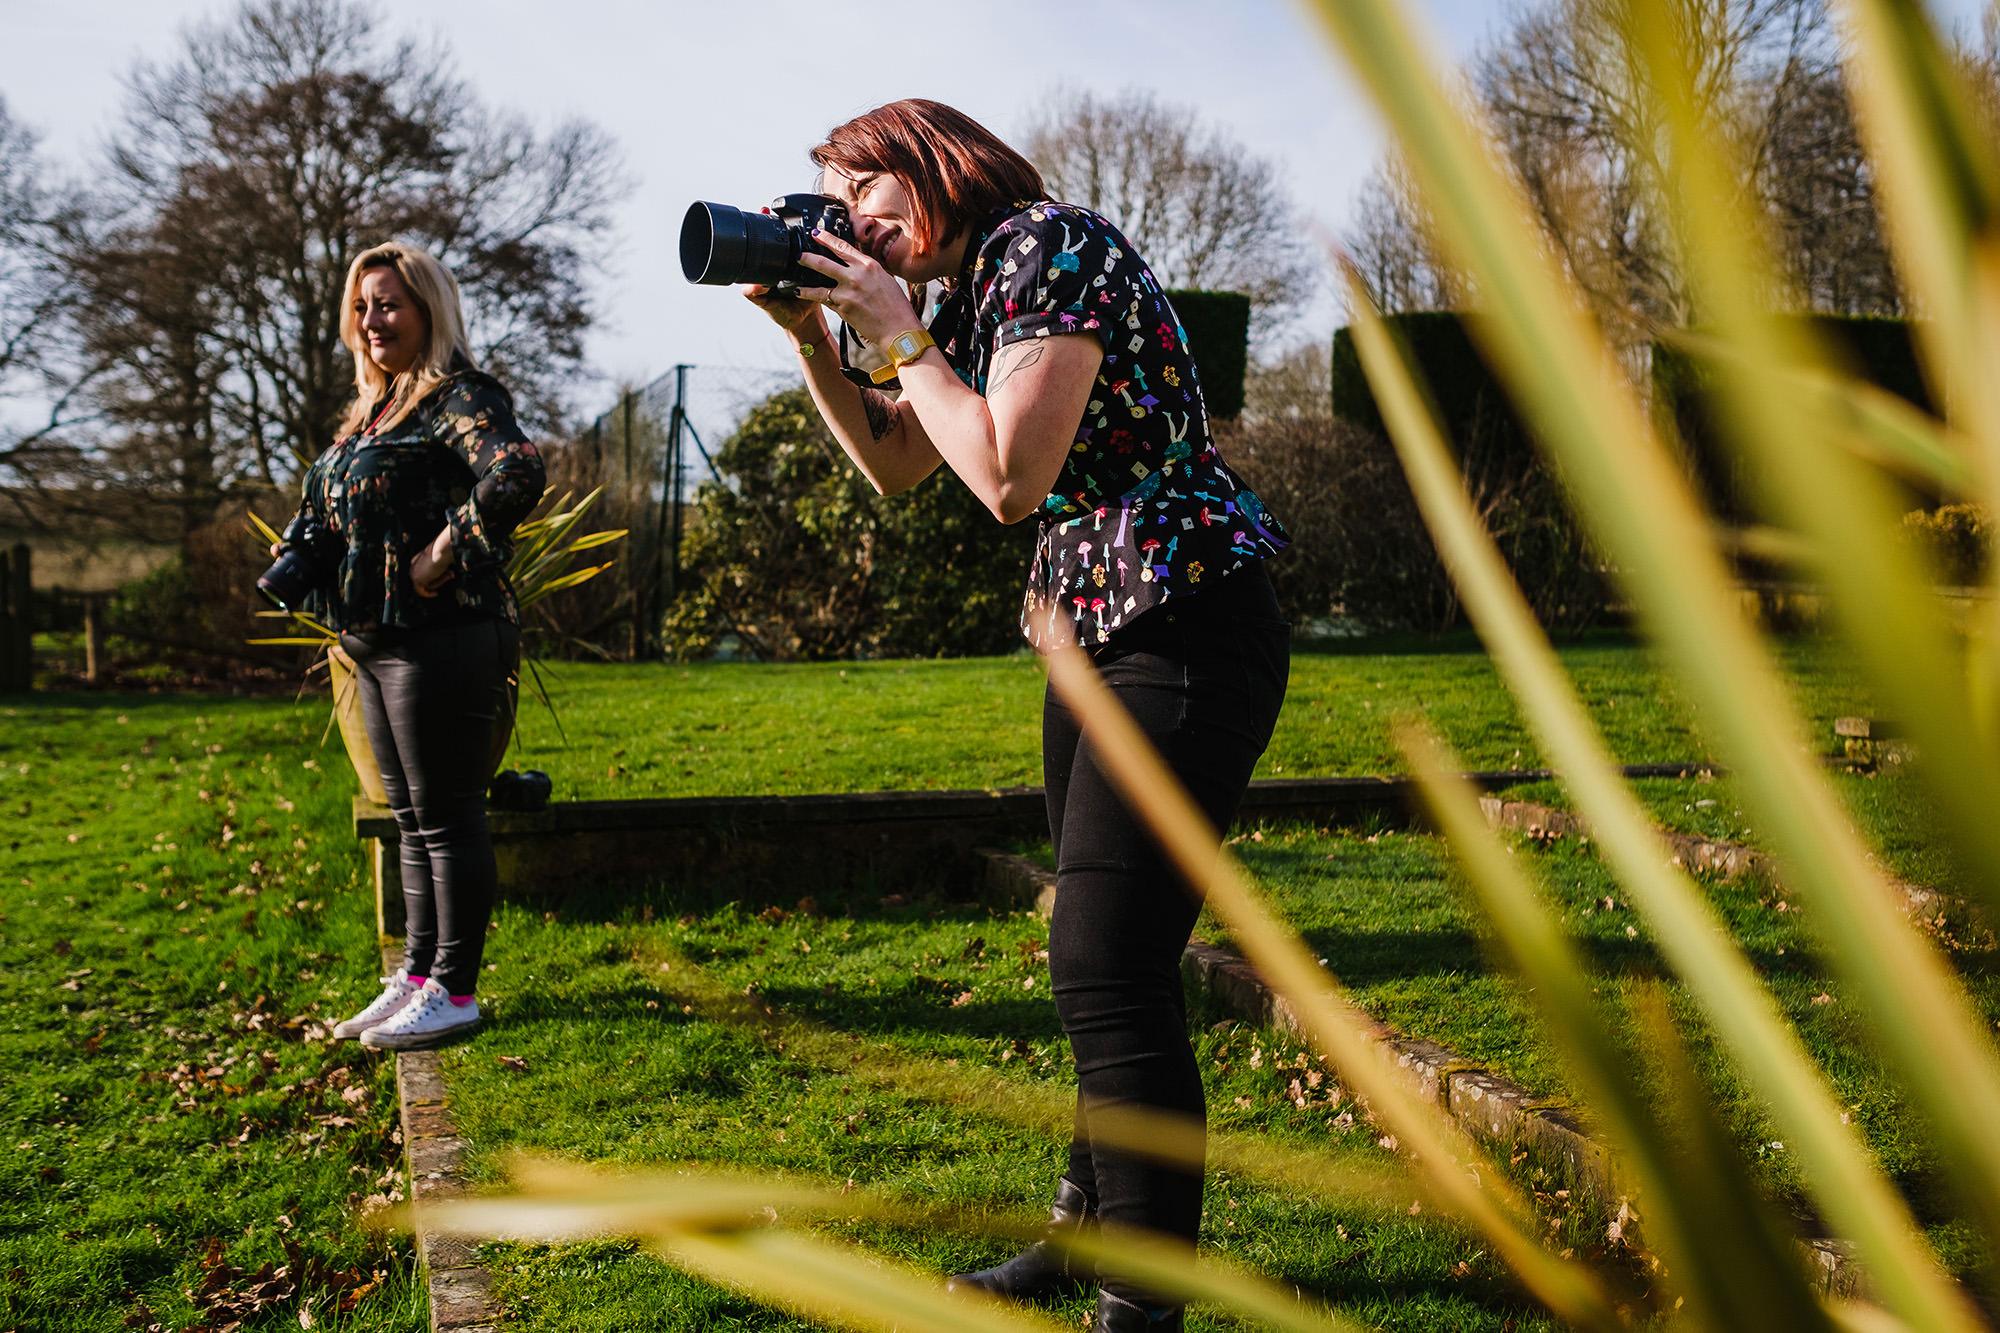 sunny day photographers shooting